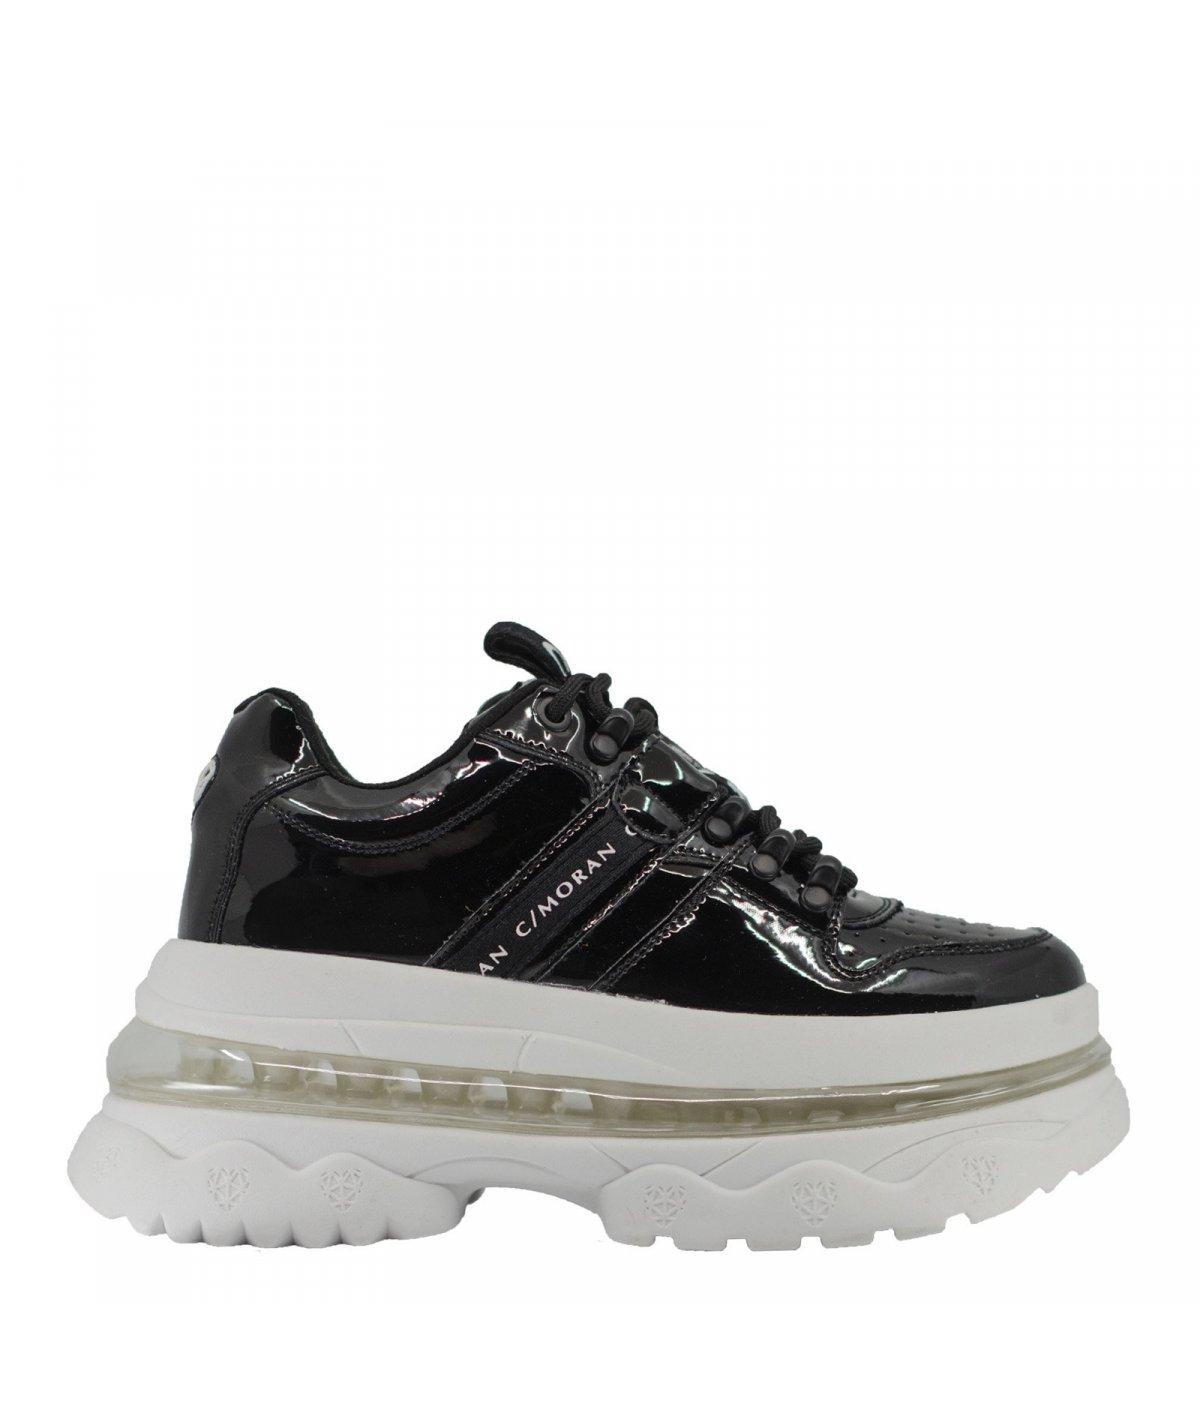 Zapatillas Mujer 327 Charol